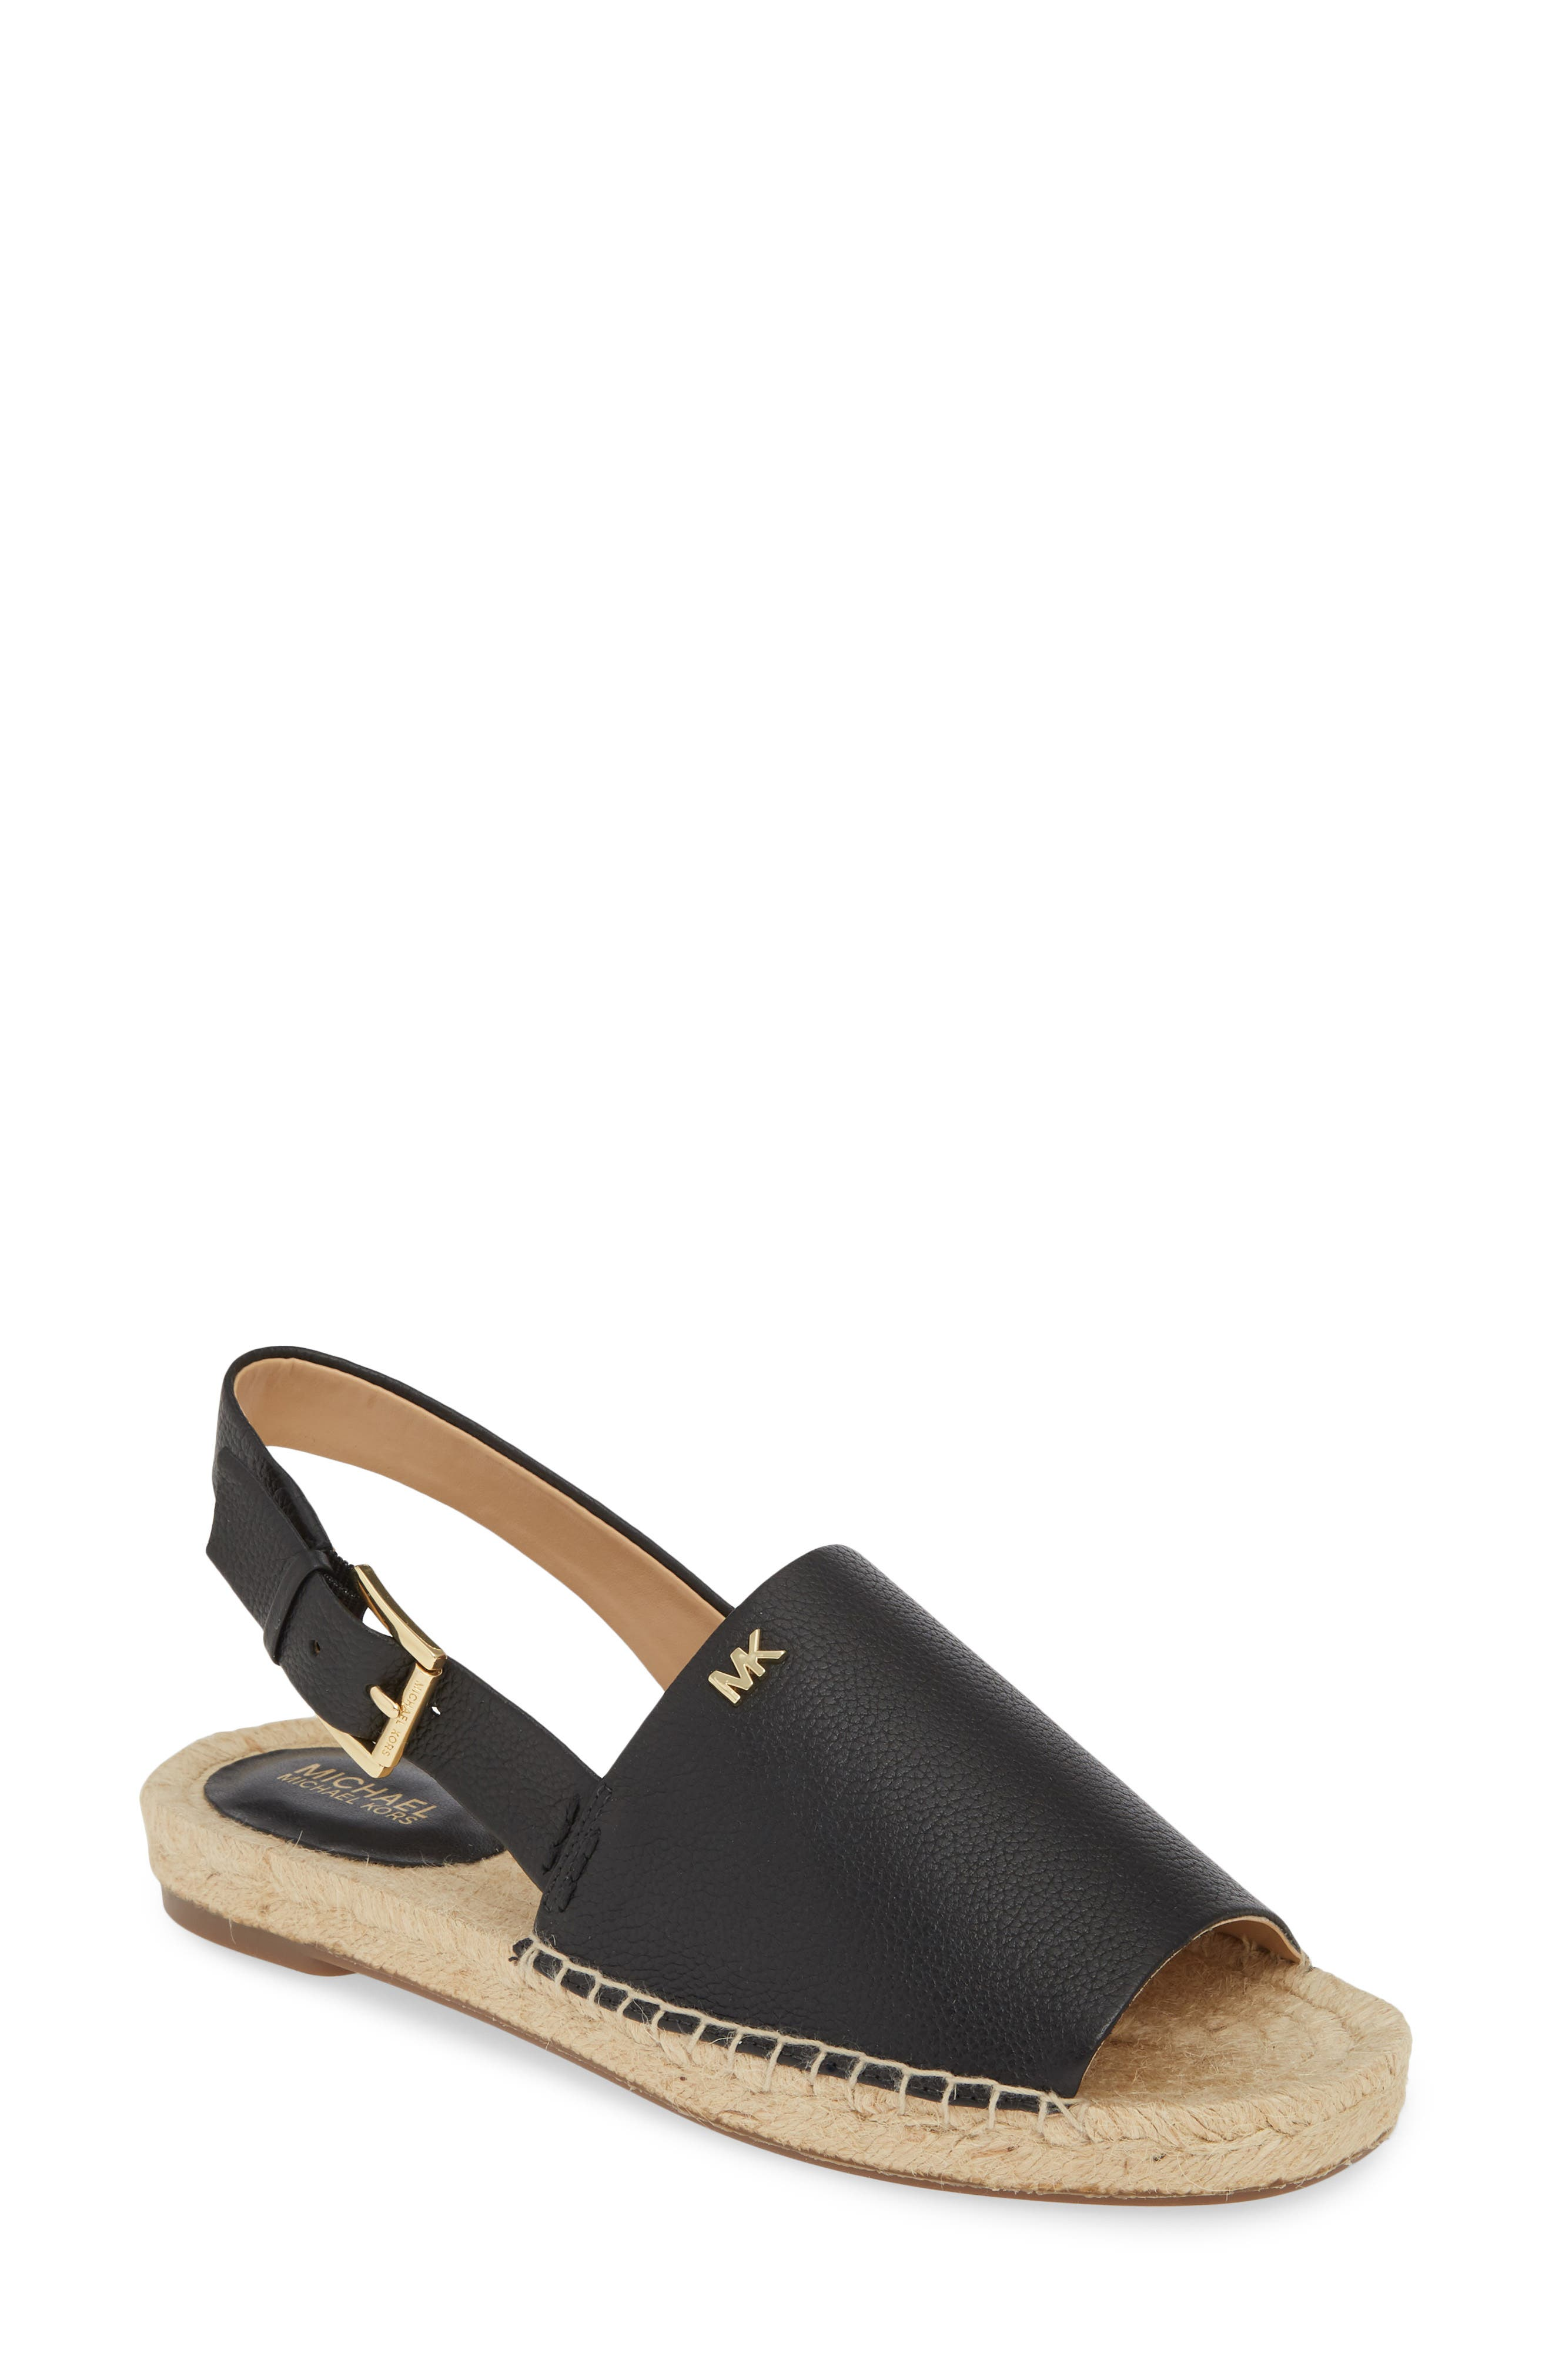 Fisher Espadrille Sandal, Main, color, BLACK TUMBLED LEATHER